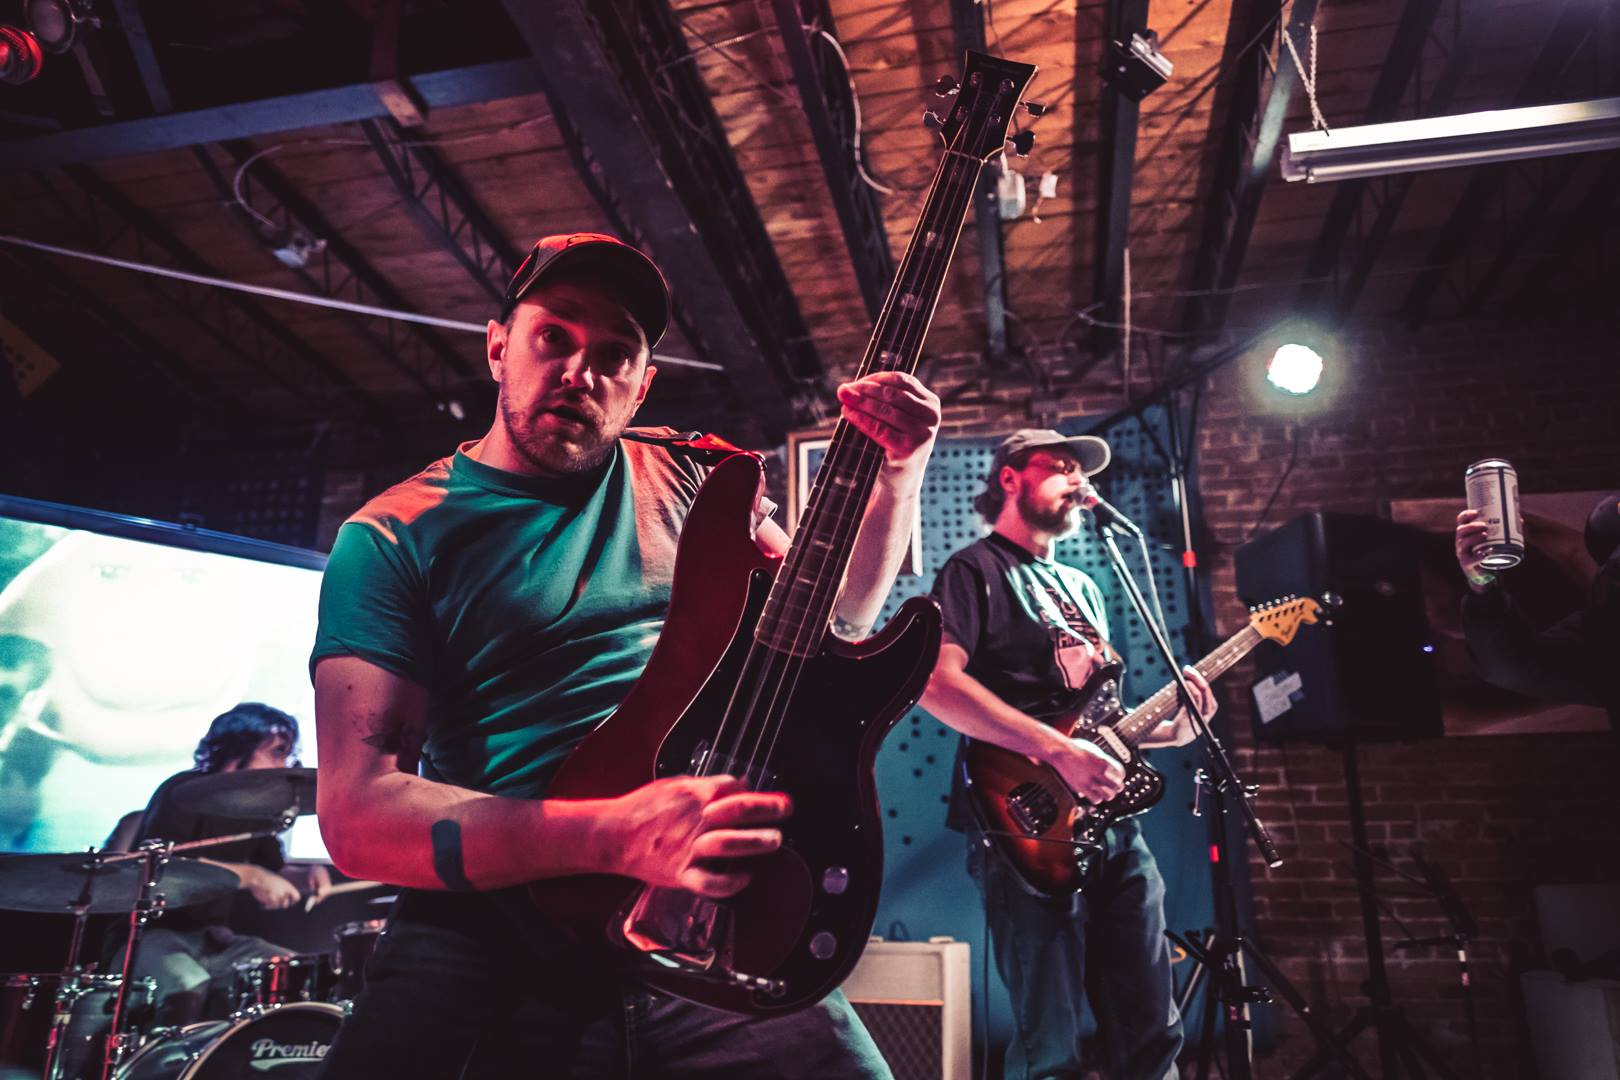 SKINKS - high energy genre fluid rock